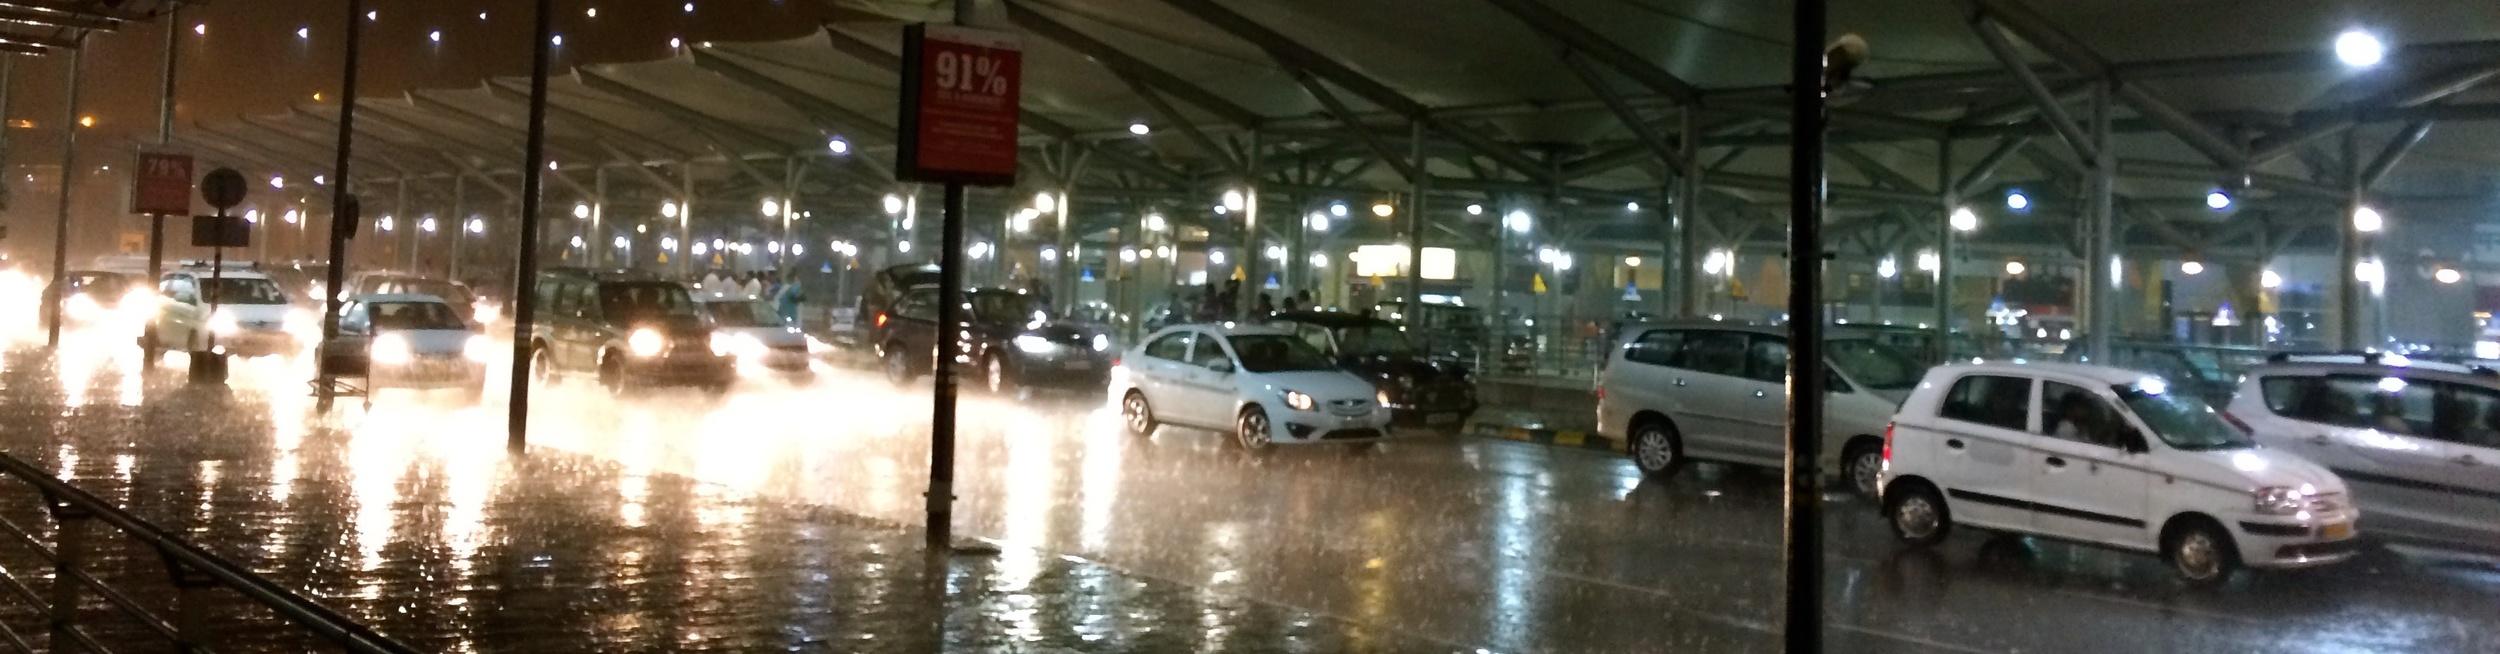 Flughafen Delhi